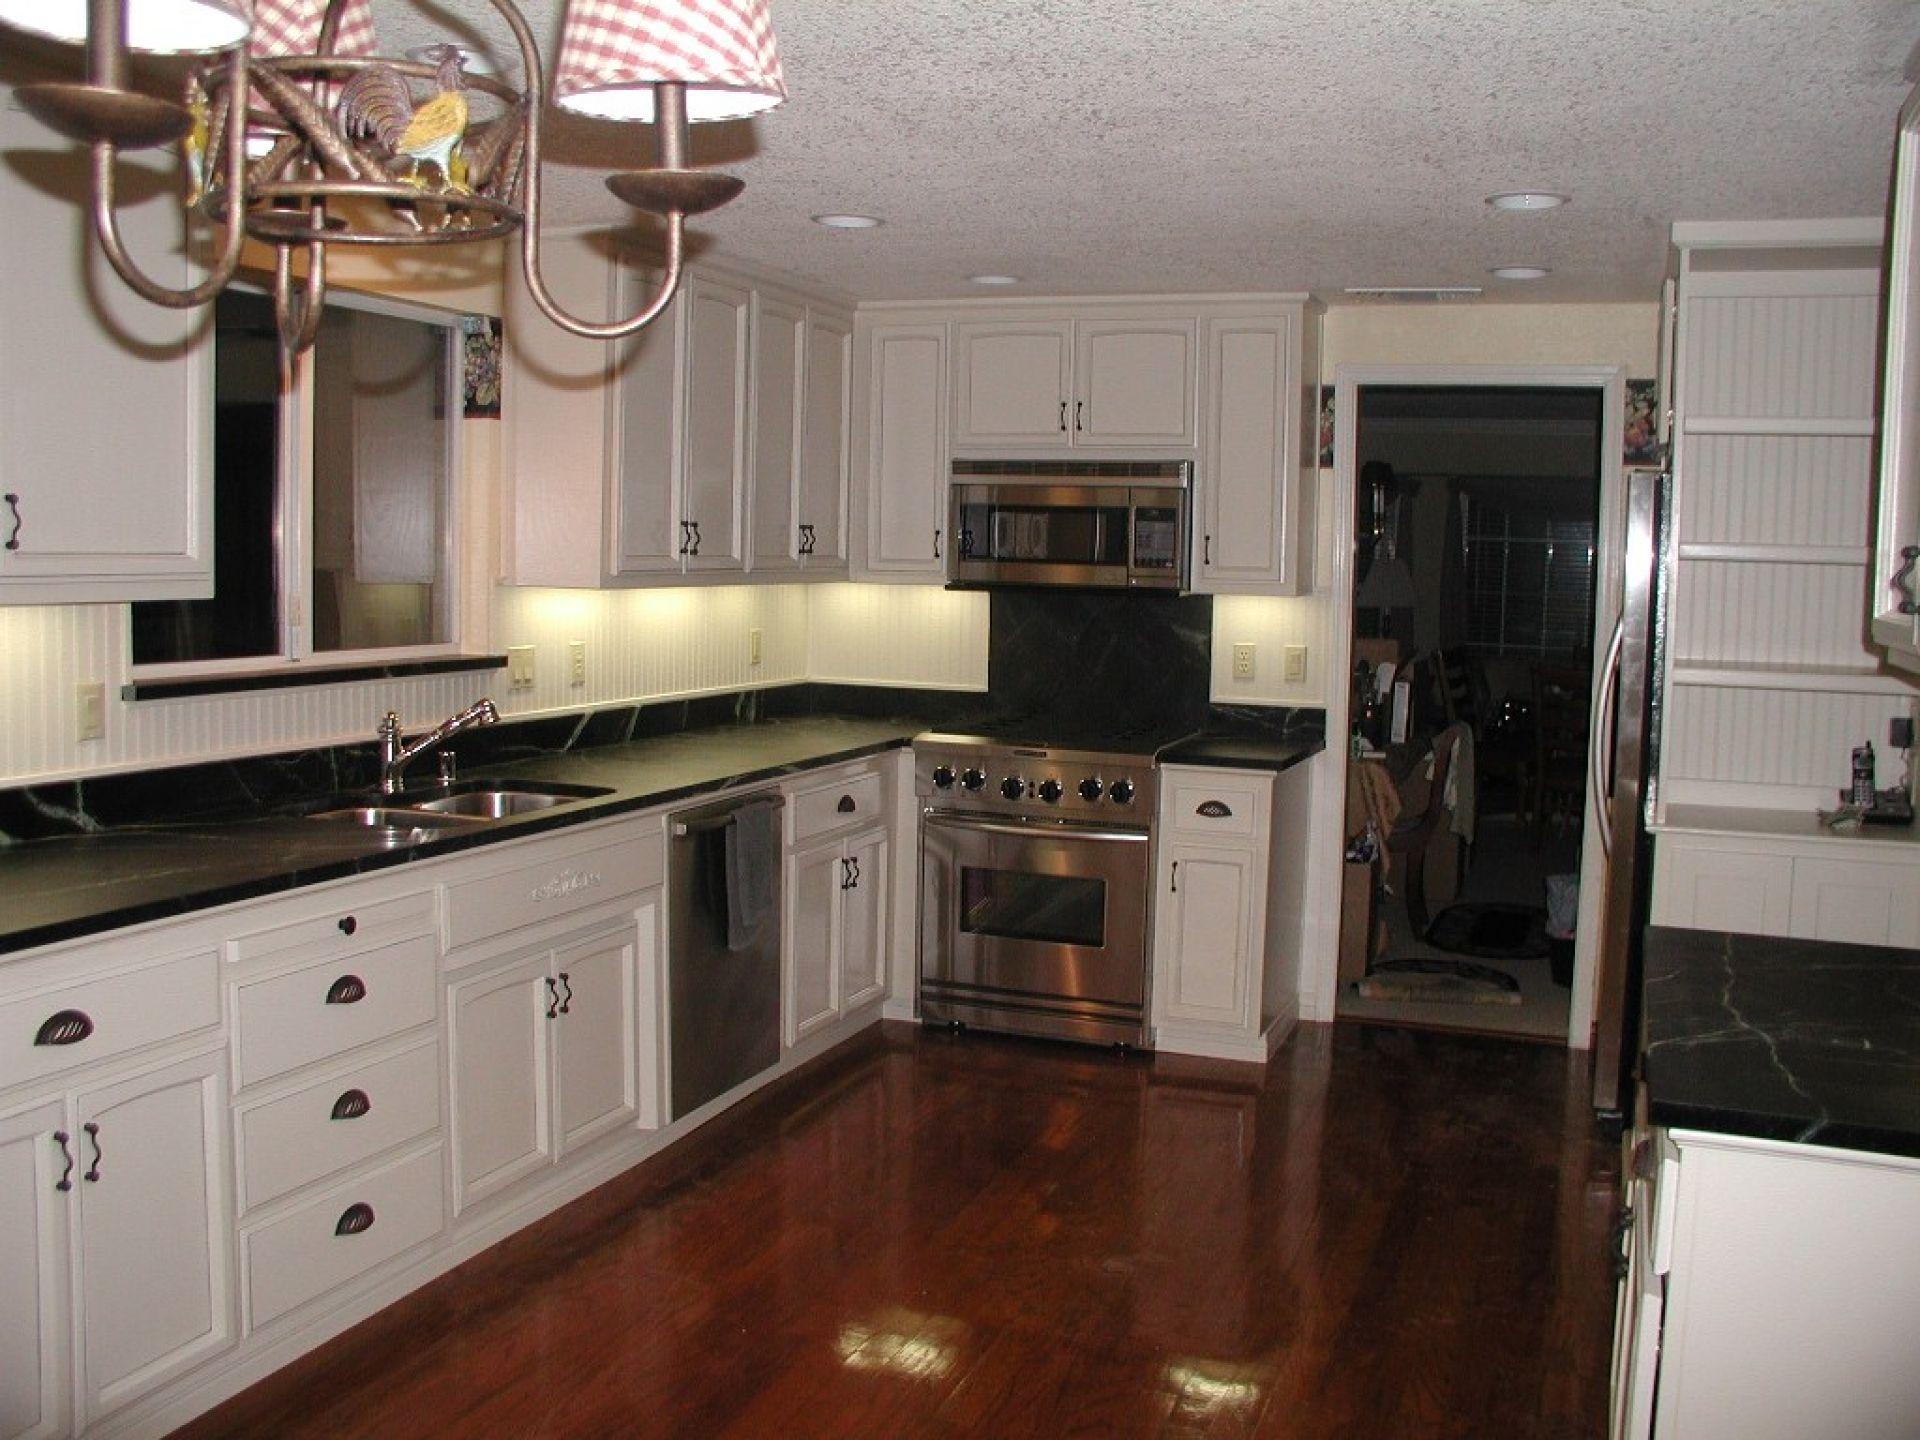 White Kitchen Cabinets With Dark Countertops Kitchen Cabinets